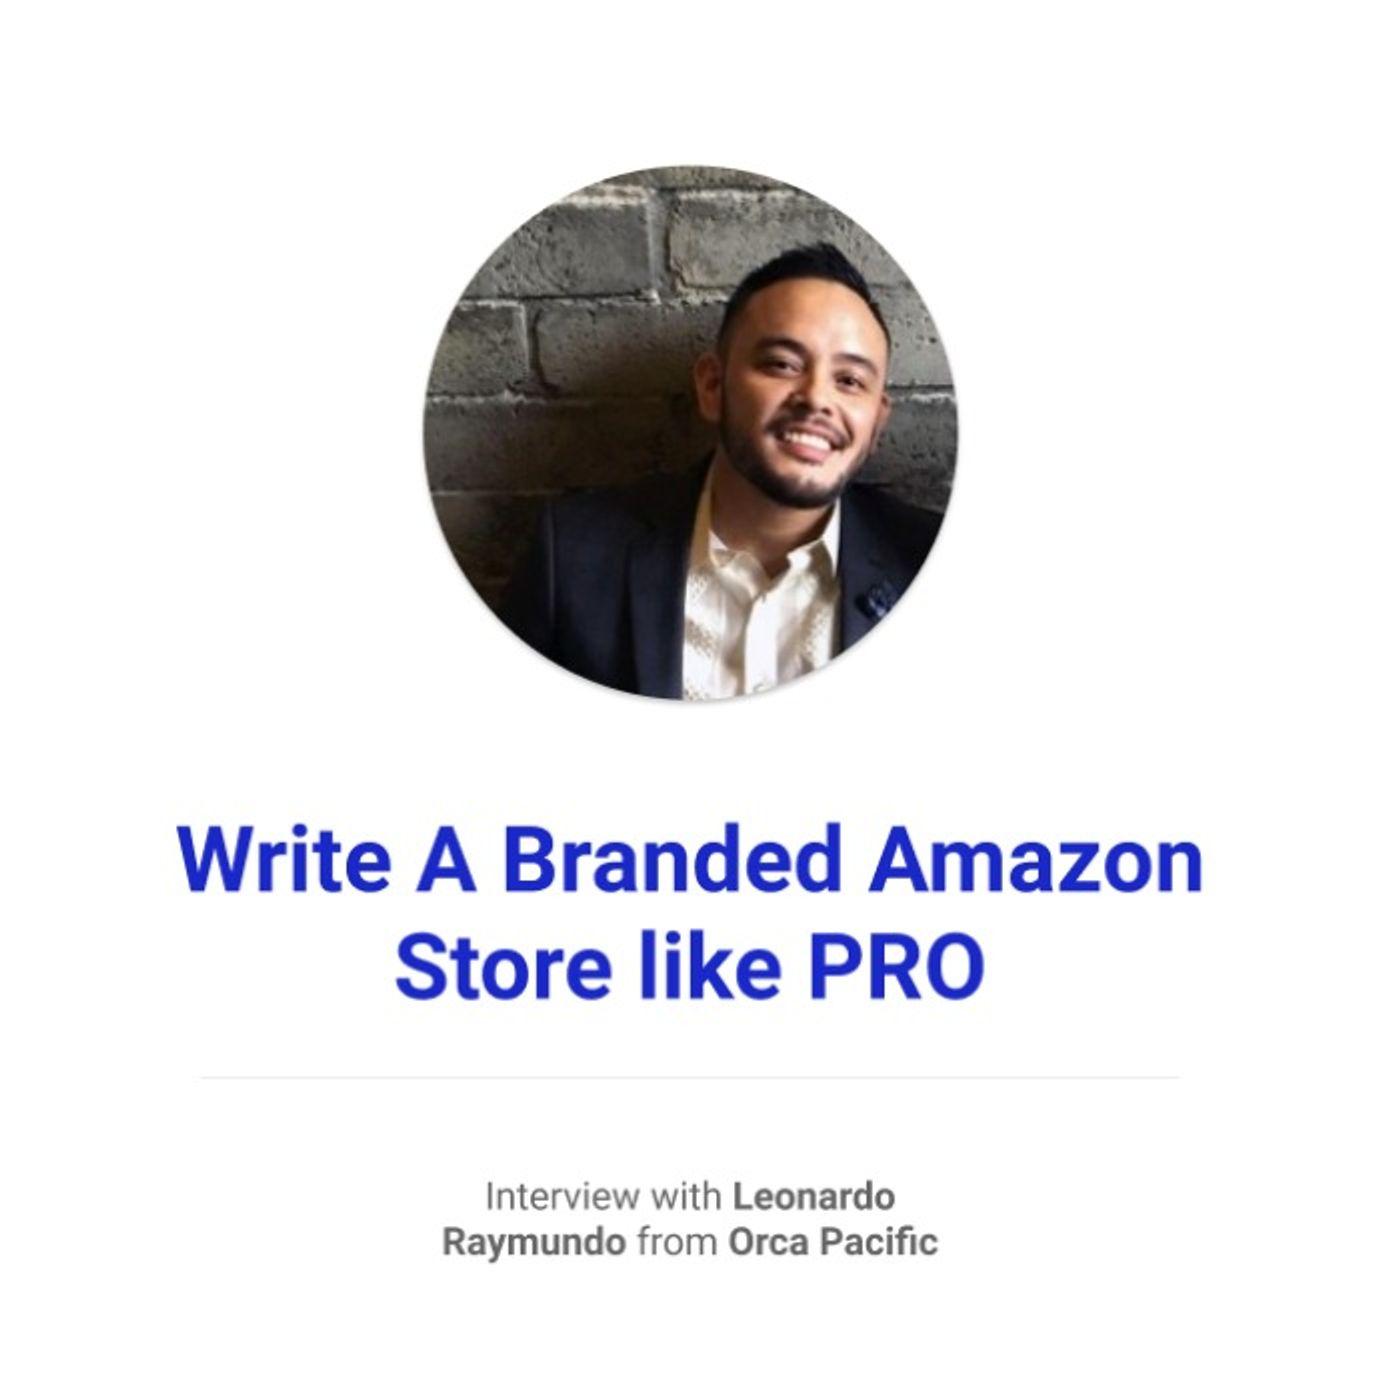 Write A Branded Amazon Store like PRO